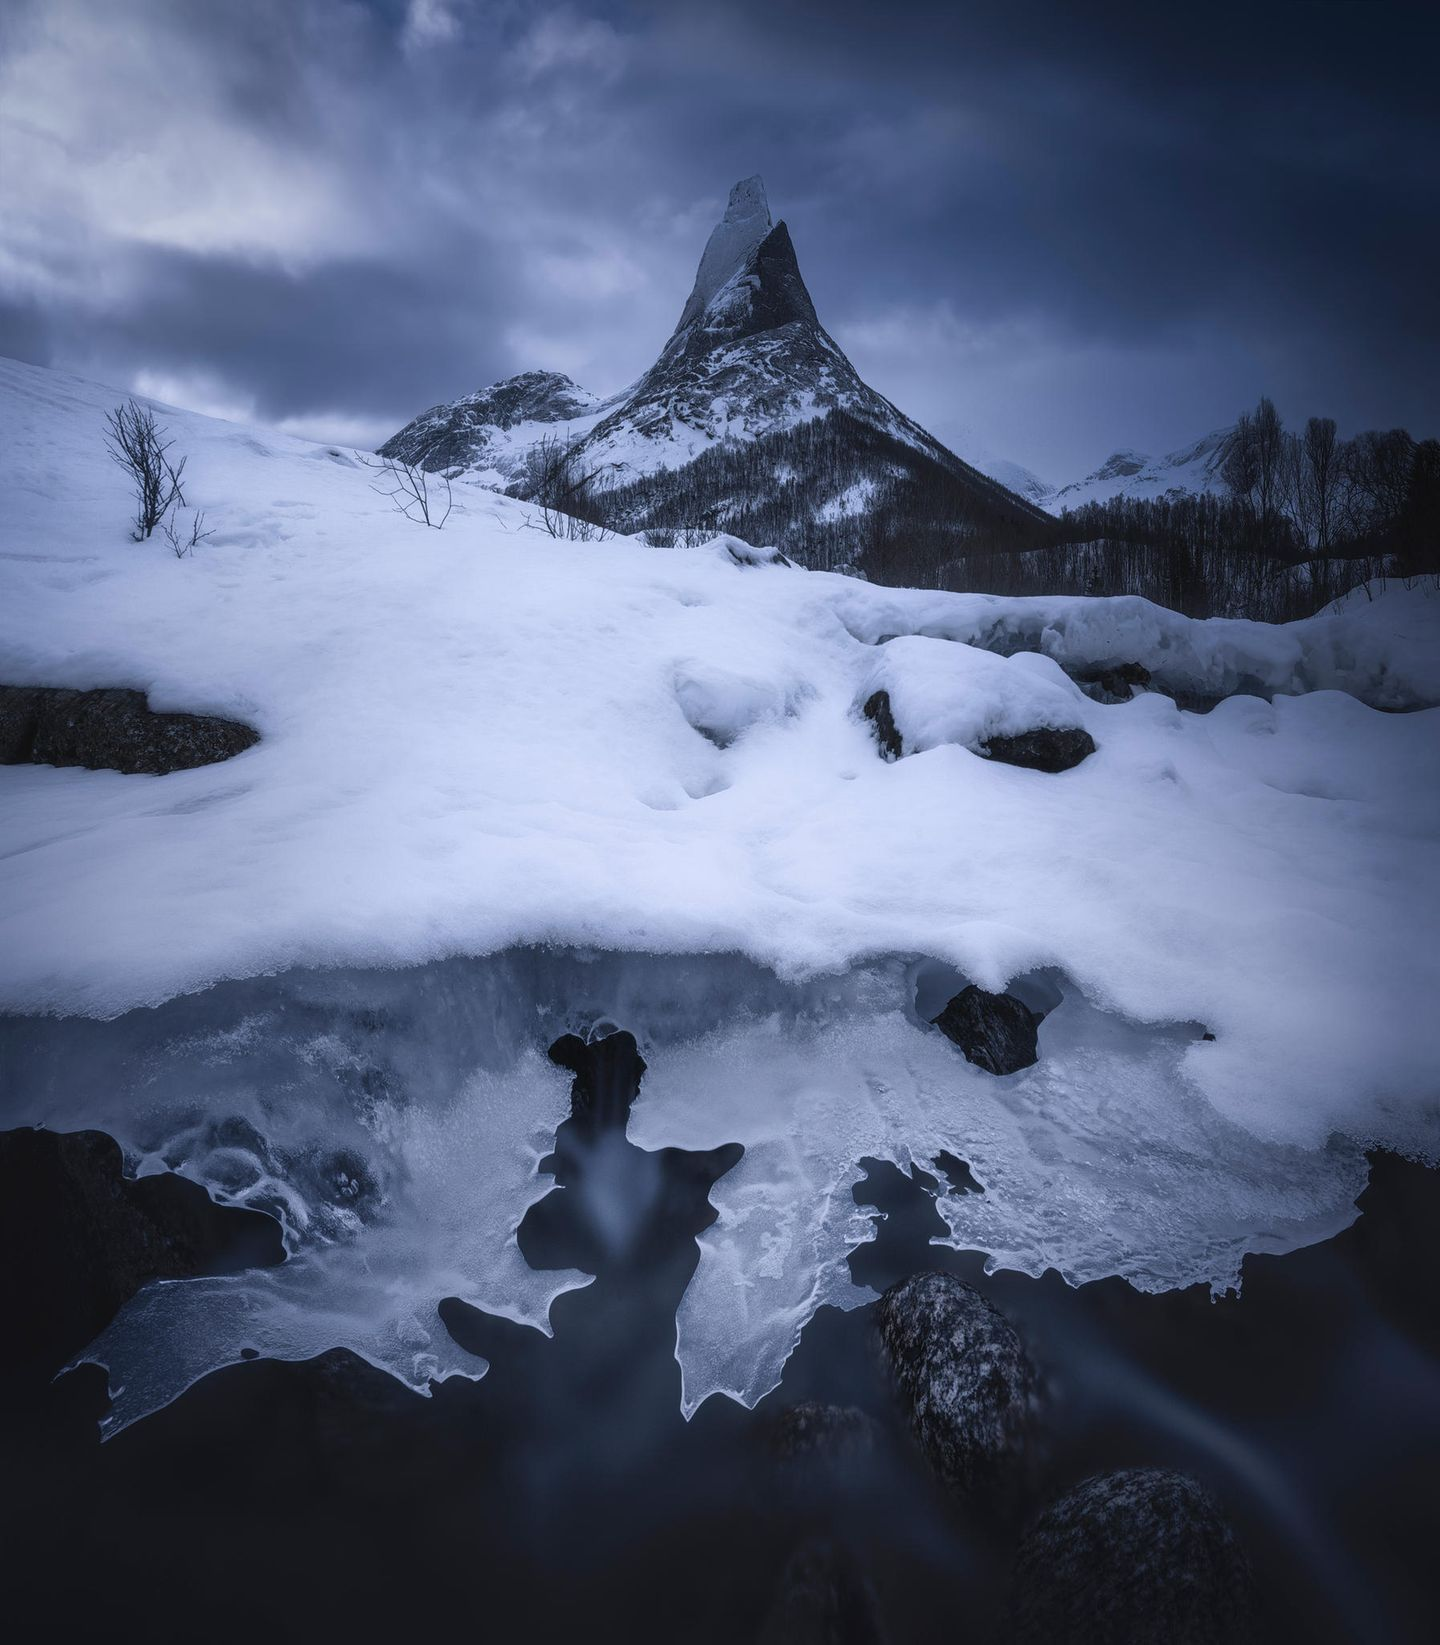 ILPOTY 2020: Schnee auf Berg